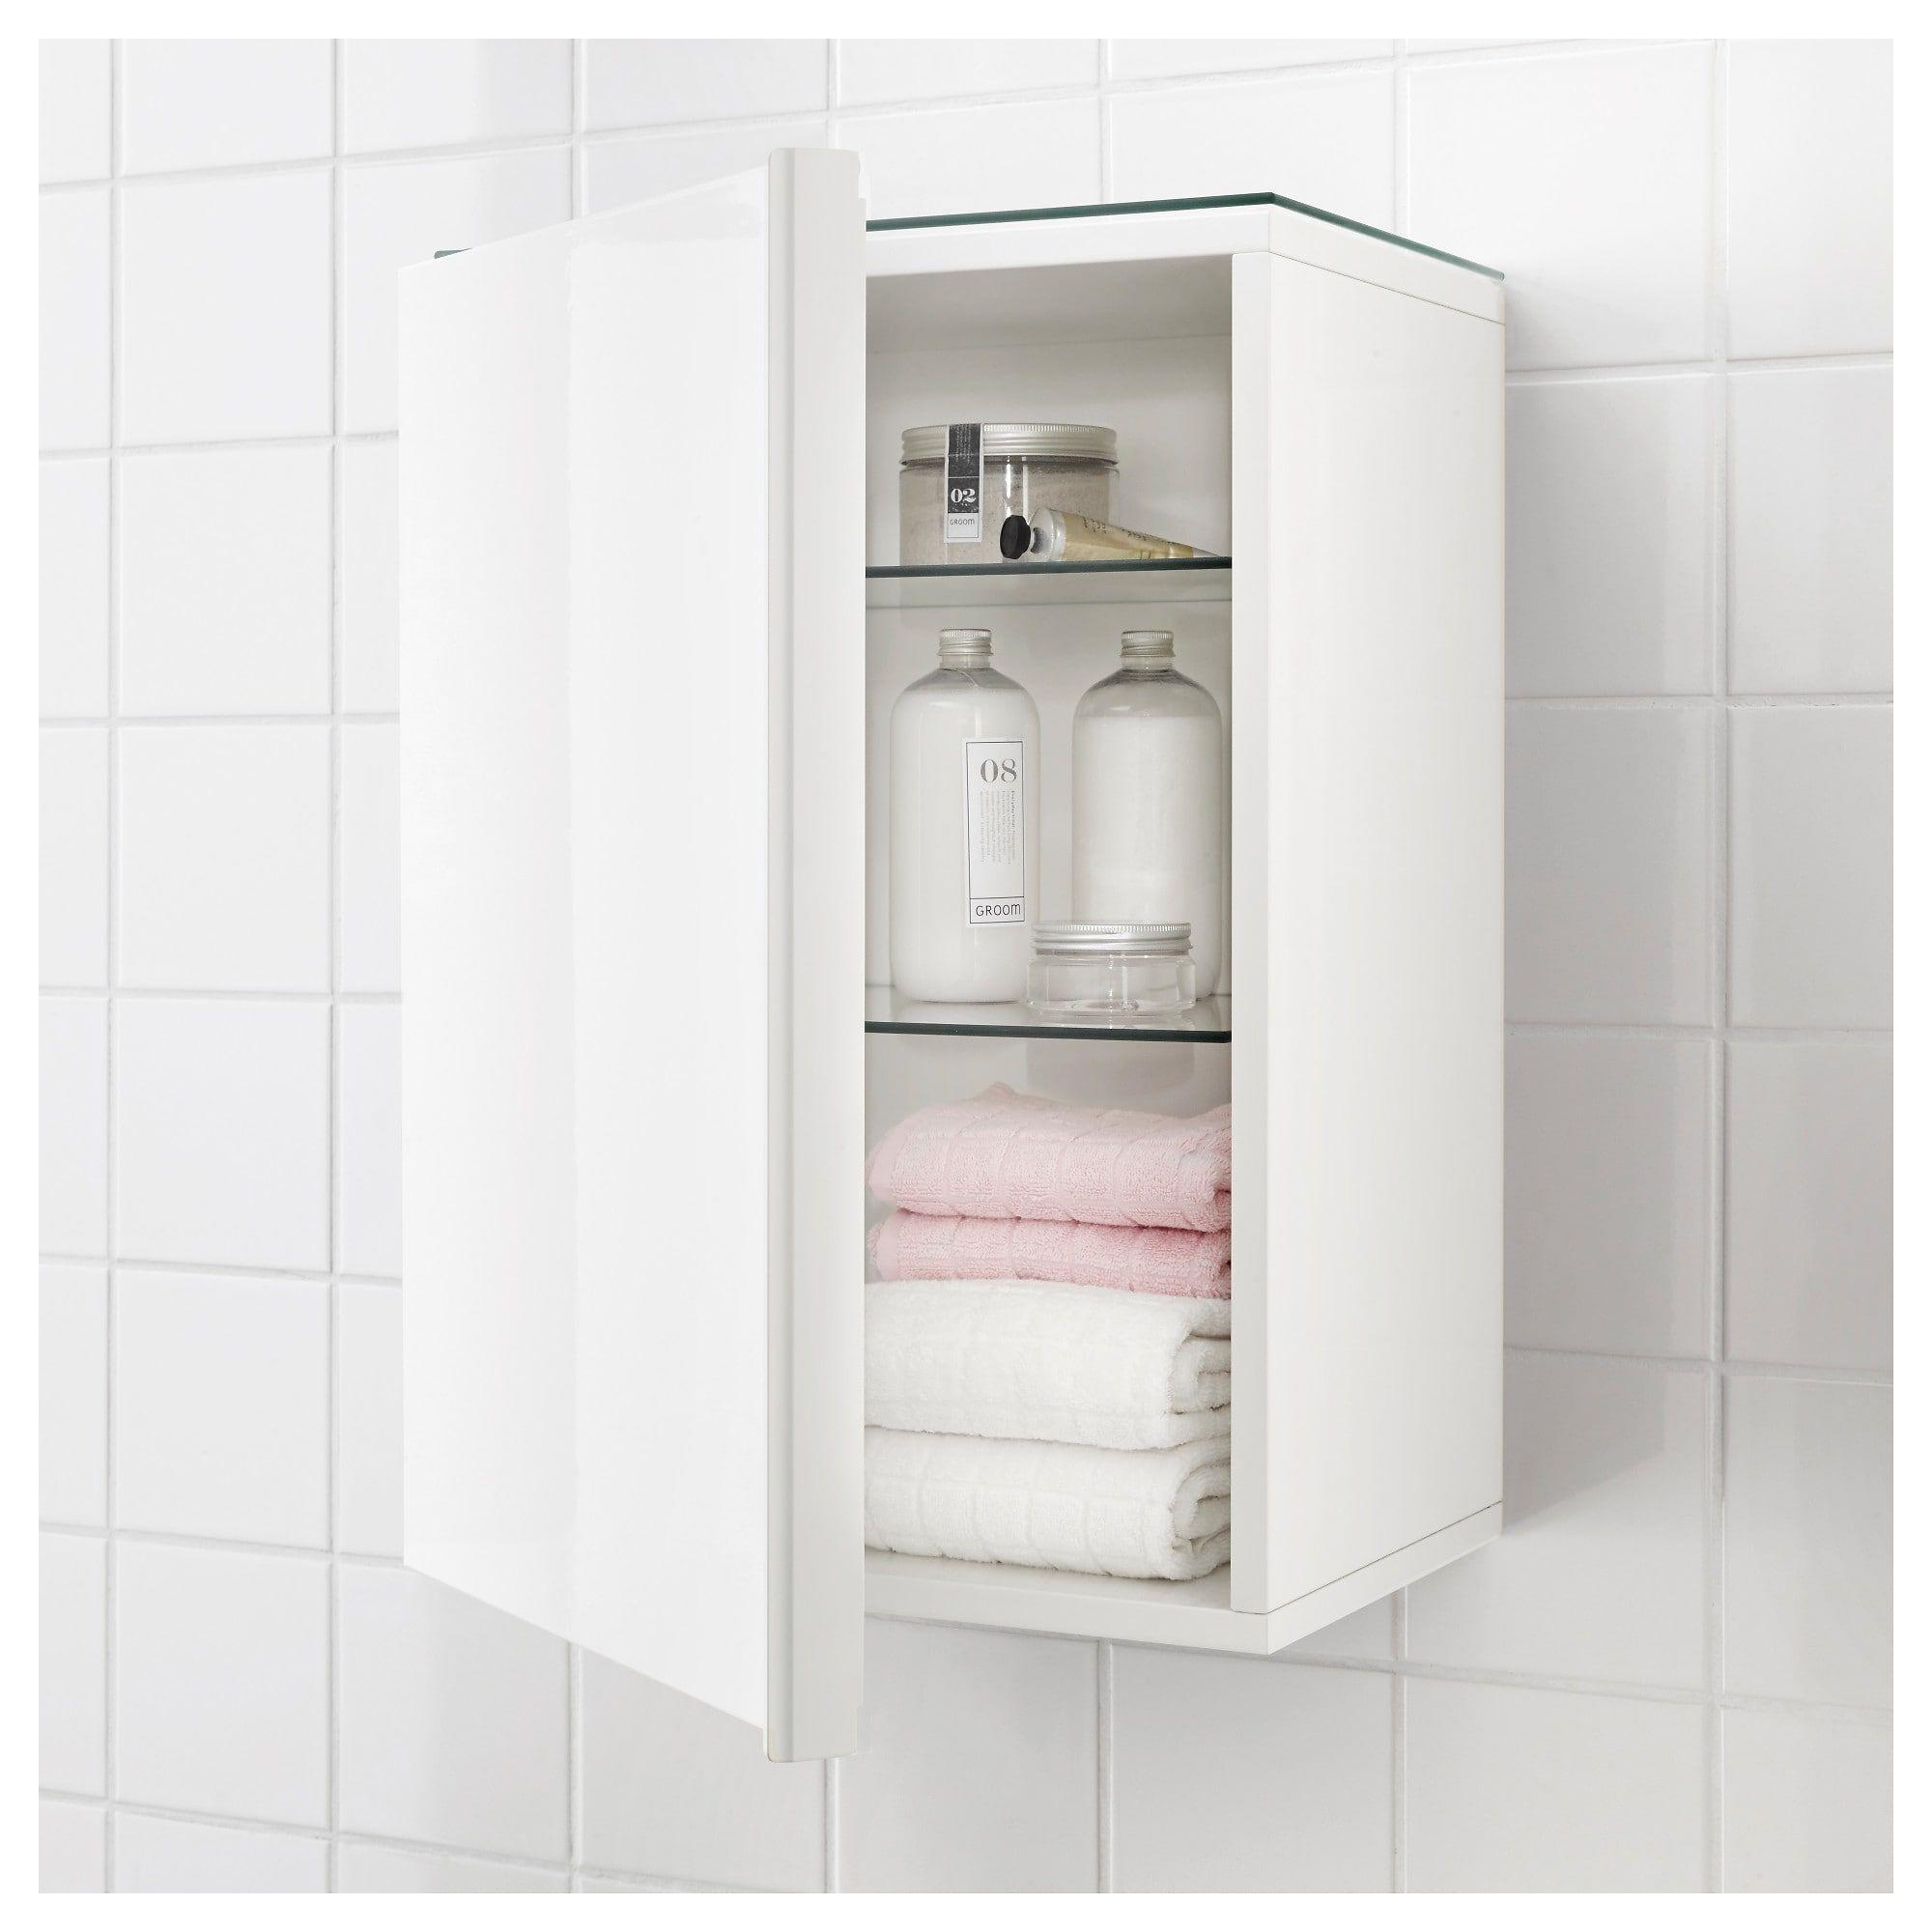 Godmorgon Wall Cabinet With 1 Door Highgloss White 40x32x58 Cm Ikea Wall Mounted Bathroom Cabinets Bathroom Wall Cabinets White Bathroom Cabinets